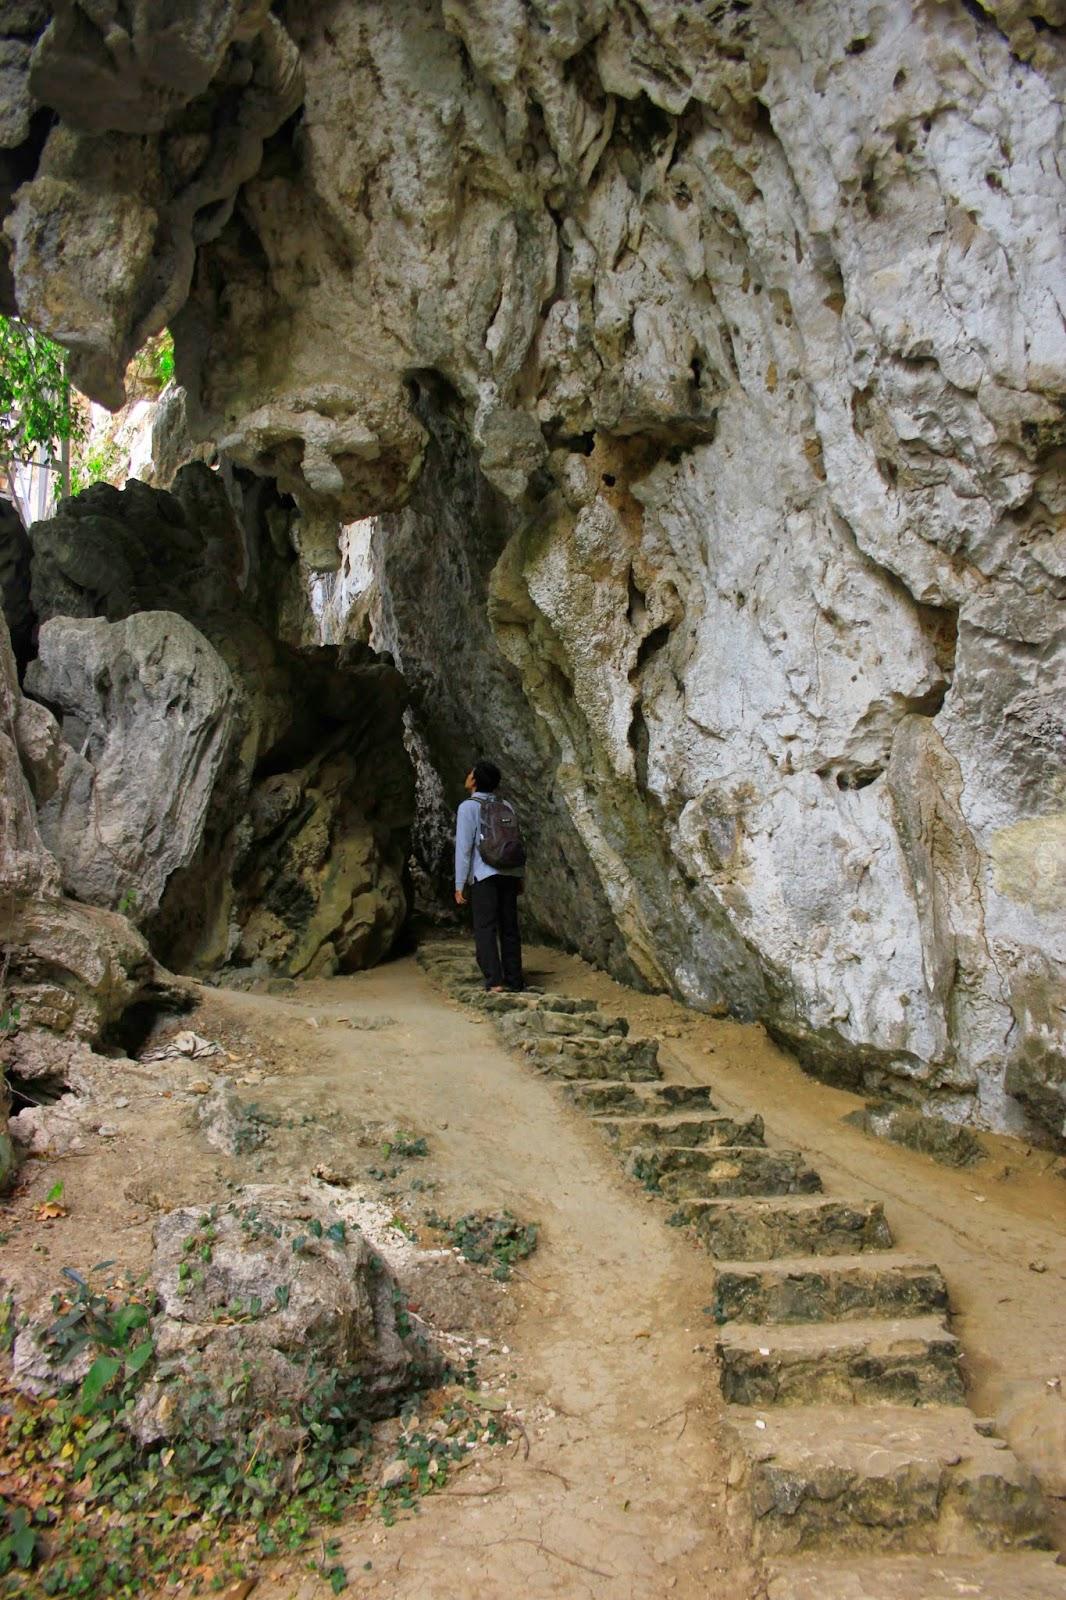 Terlempar Silam Taman Purbakala Leang Ardiyanta Teman Luar Kota Biasanya